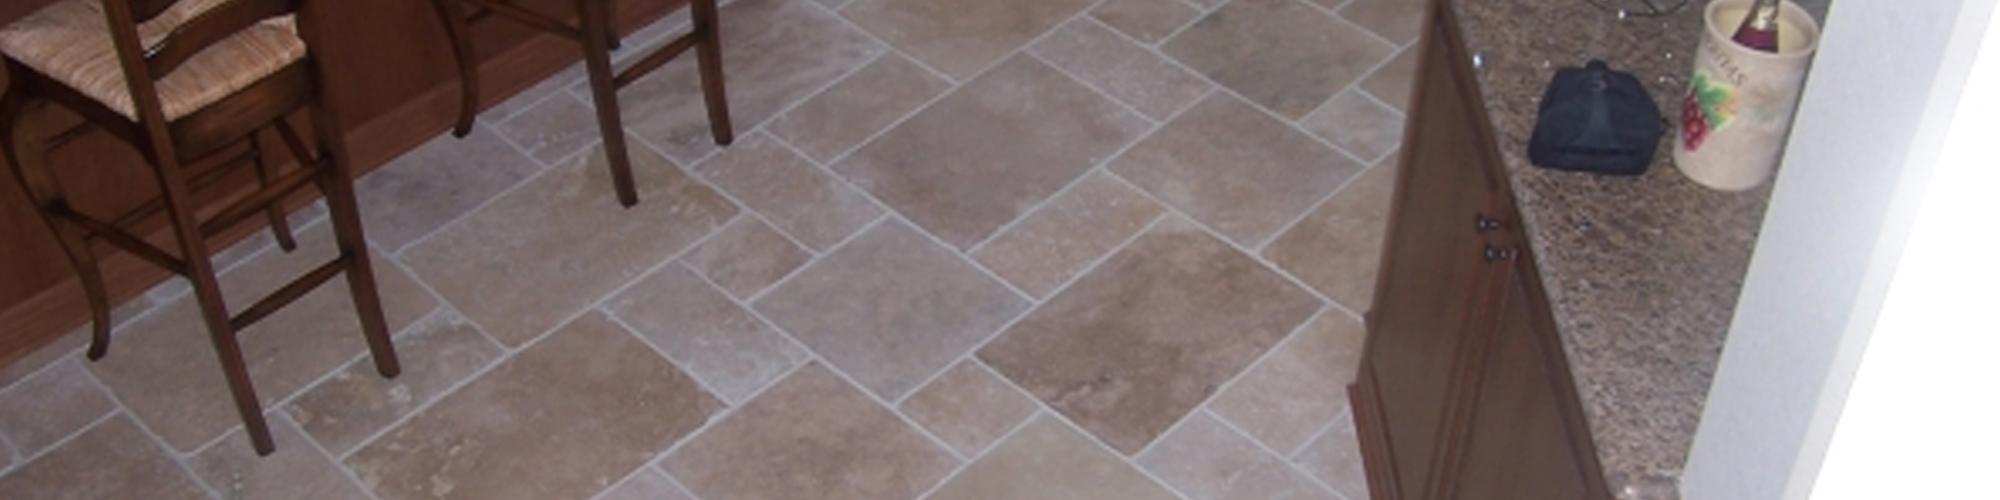 Home berry ceramic tile stonework dailygadgetfo Gallery